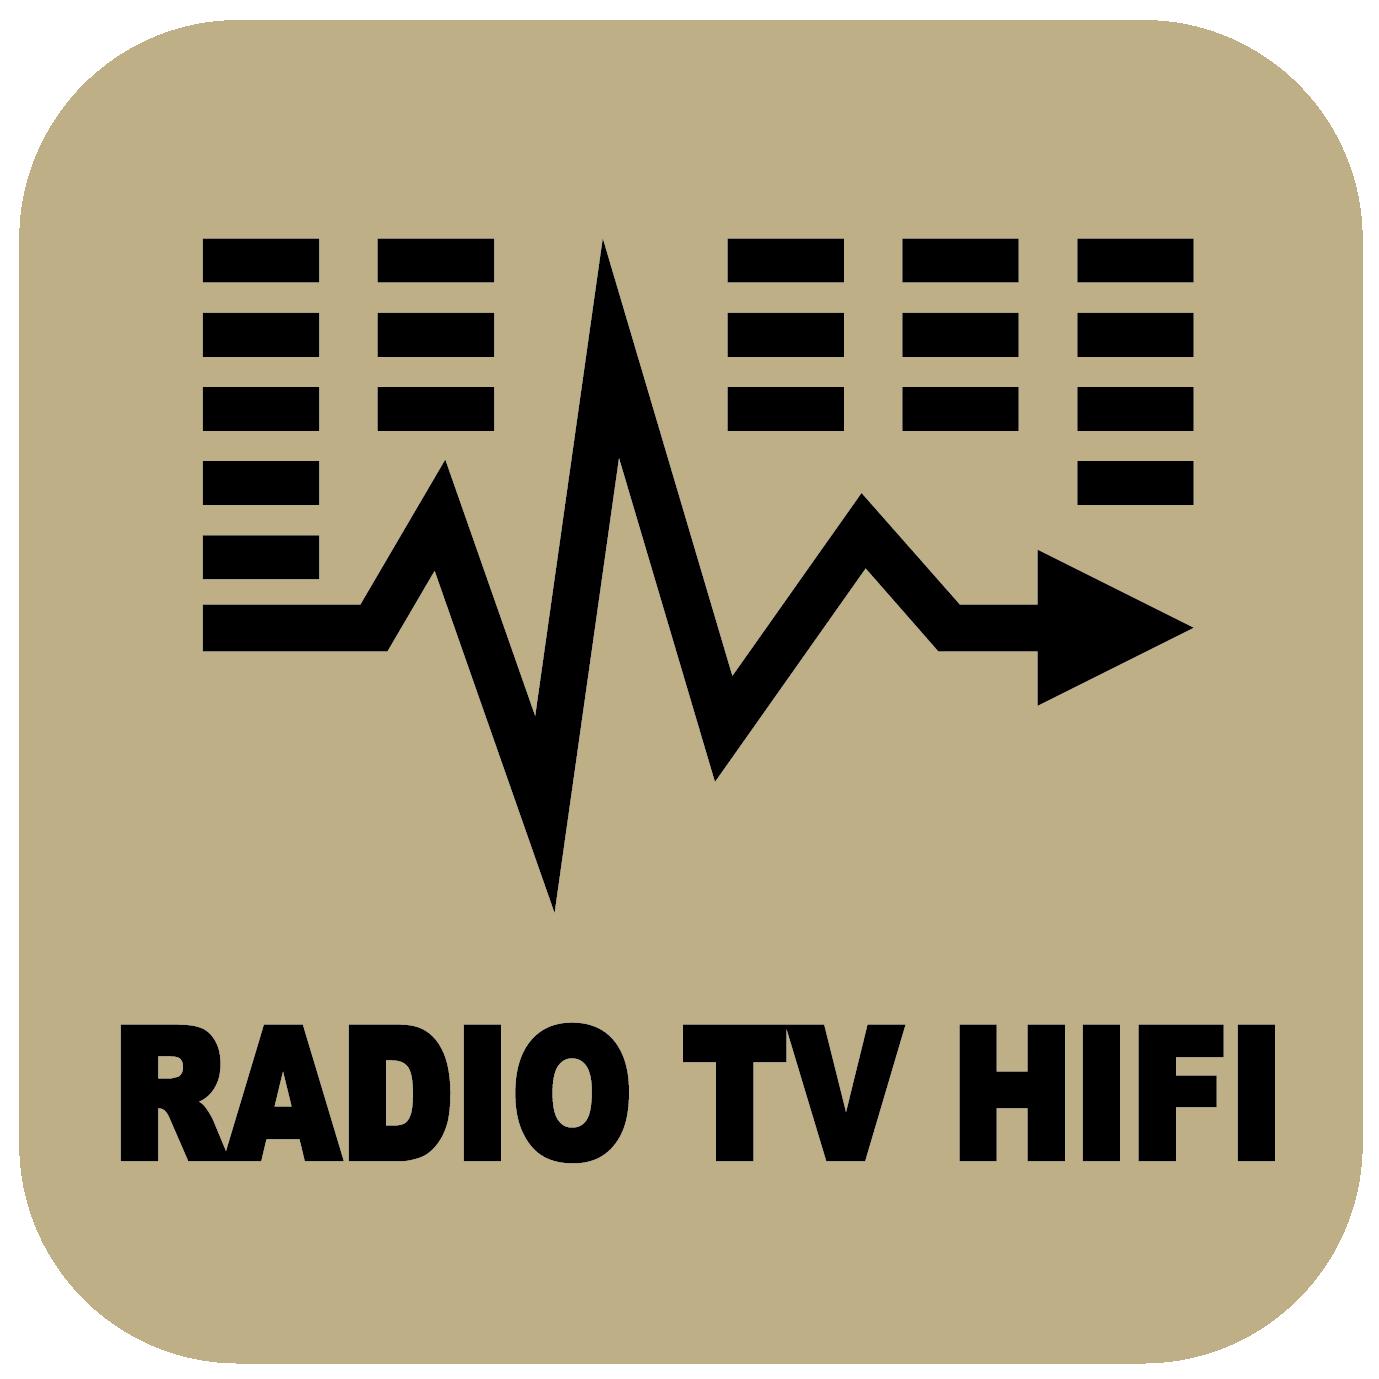 Radio-TV-Hi Fi à louer - 28.0 m2 - 44 - Loire-Atlantique